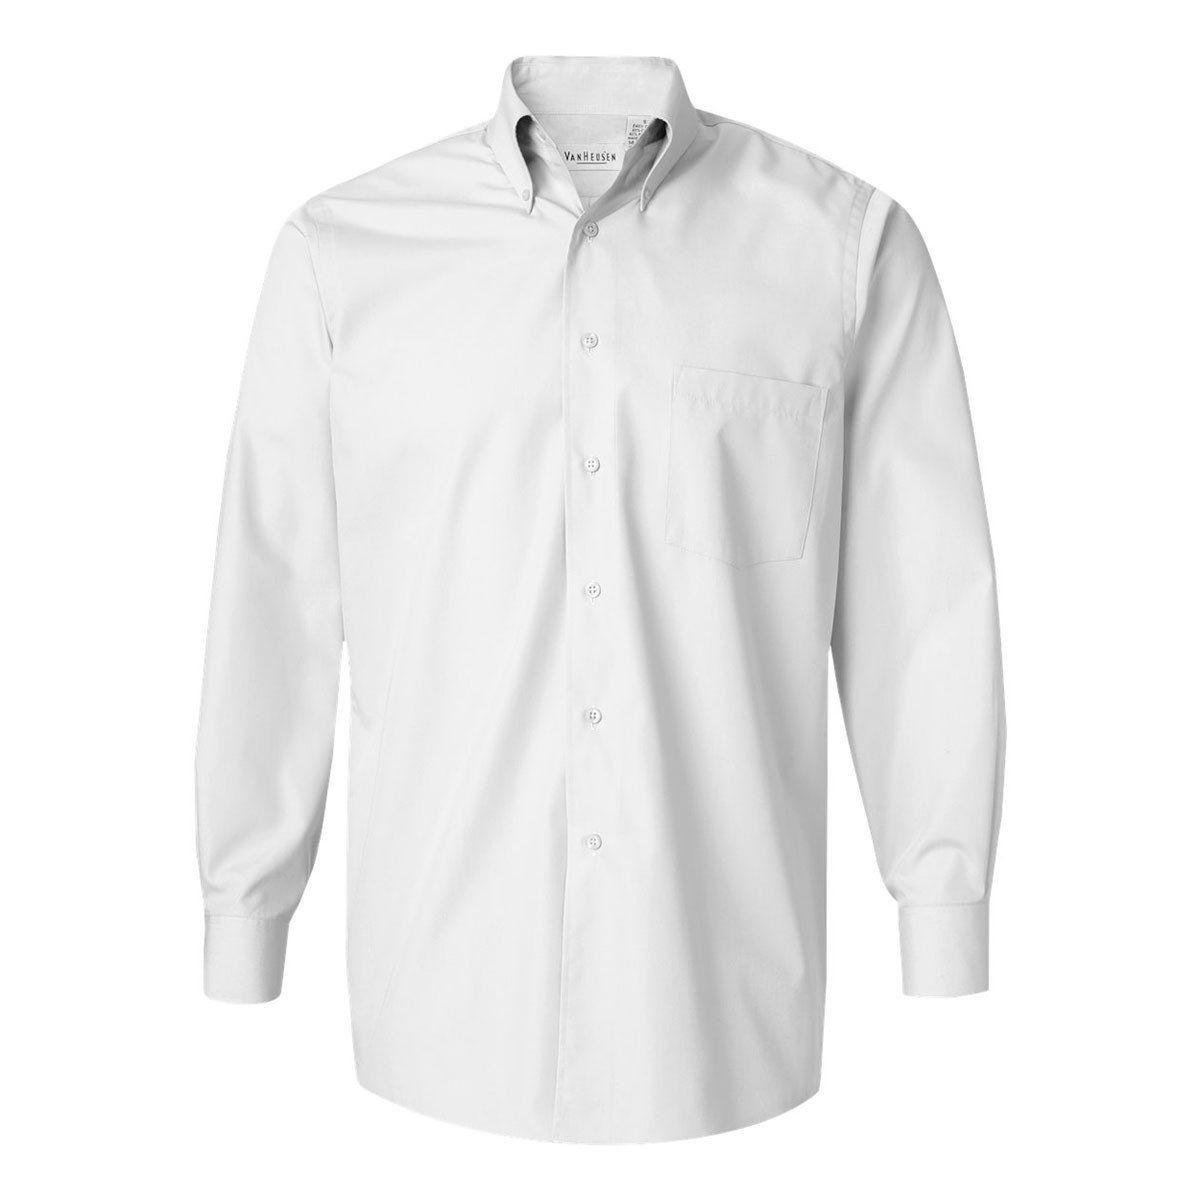 Van Heusen Mens White Silky Poplin Dress Shirt Pinterest Dress